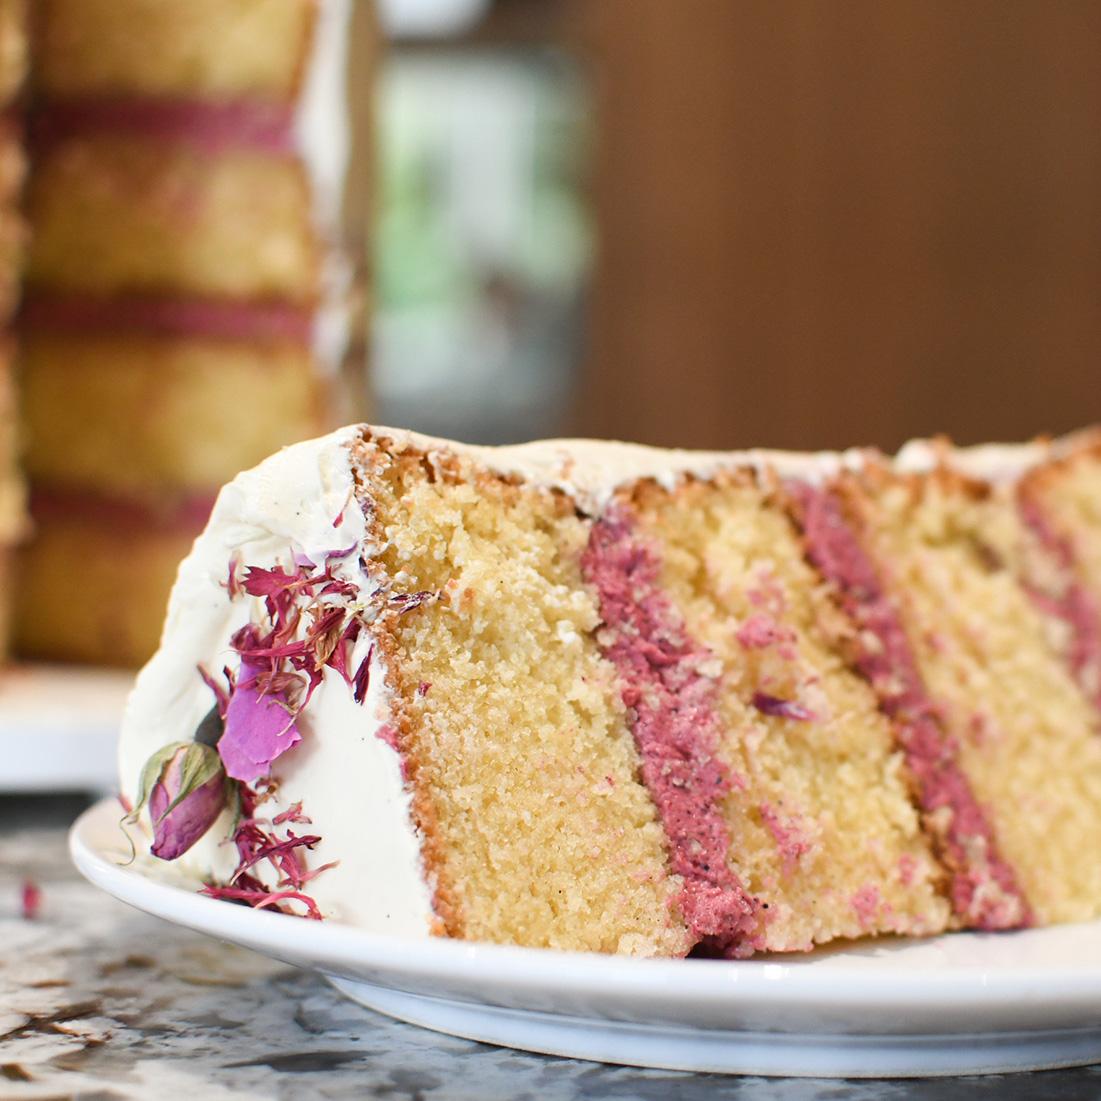 Slice of Birthday Cake - Vanilla Cake with Purple Blackcurrant Buttercream